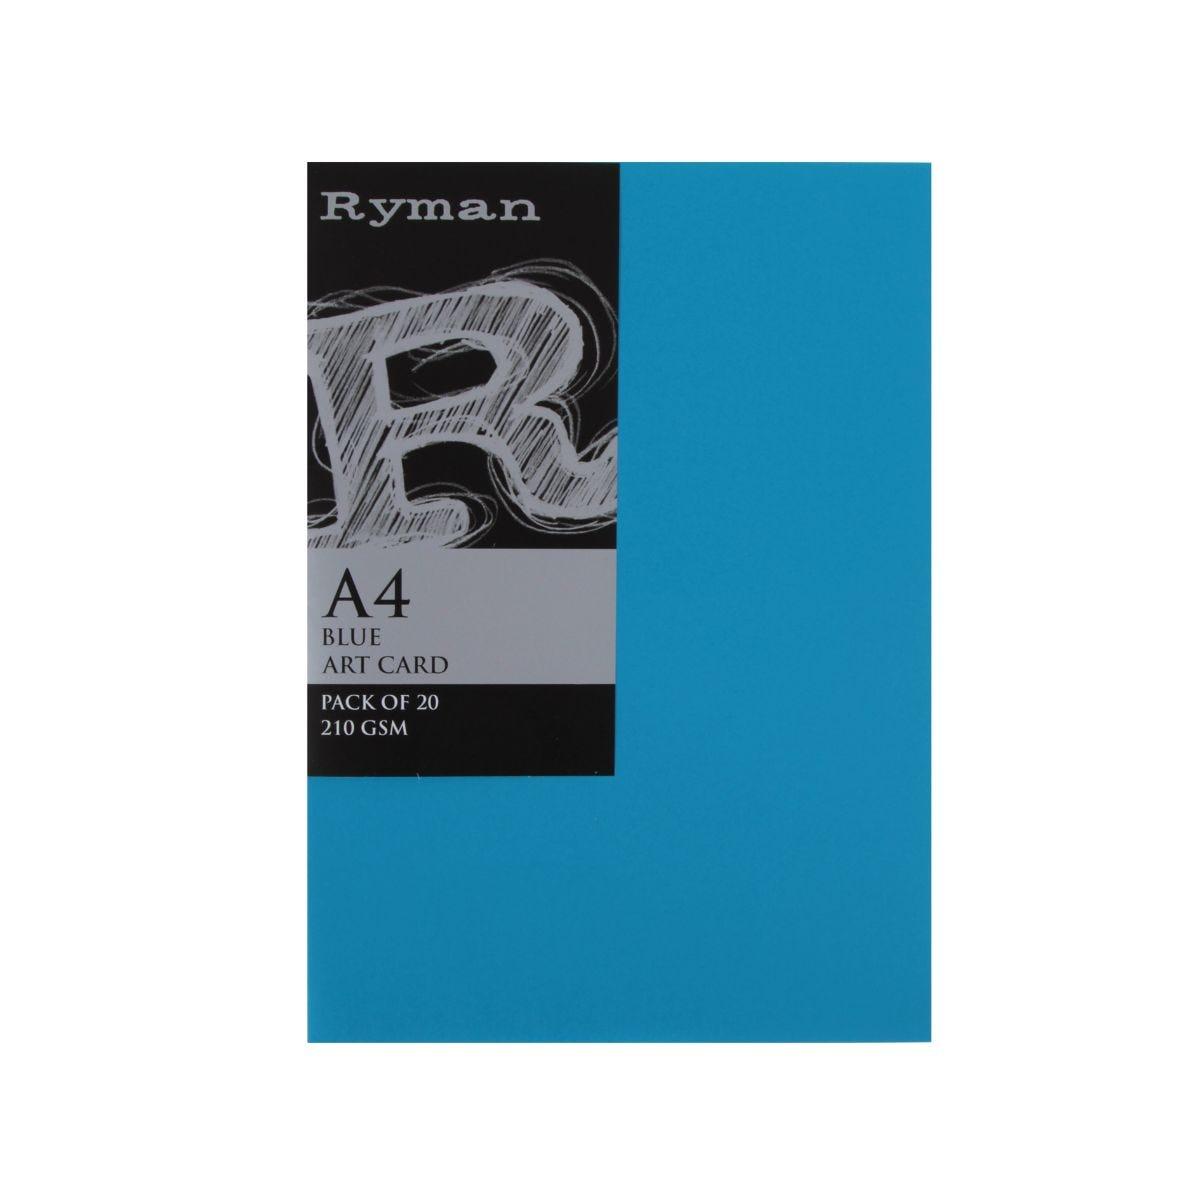 Ryman Artcard A4 210gsm Pack of 20, Blue